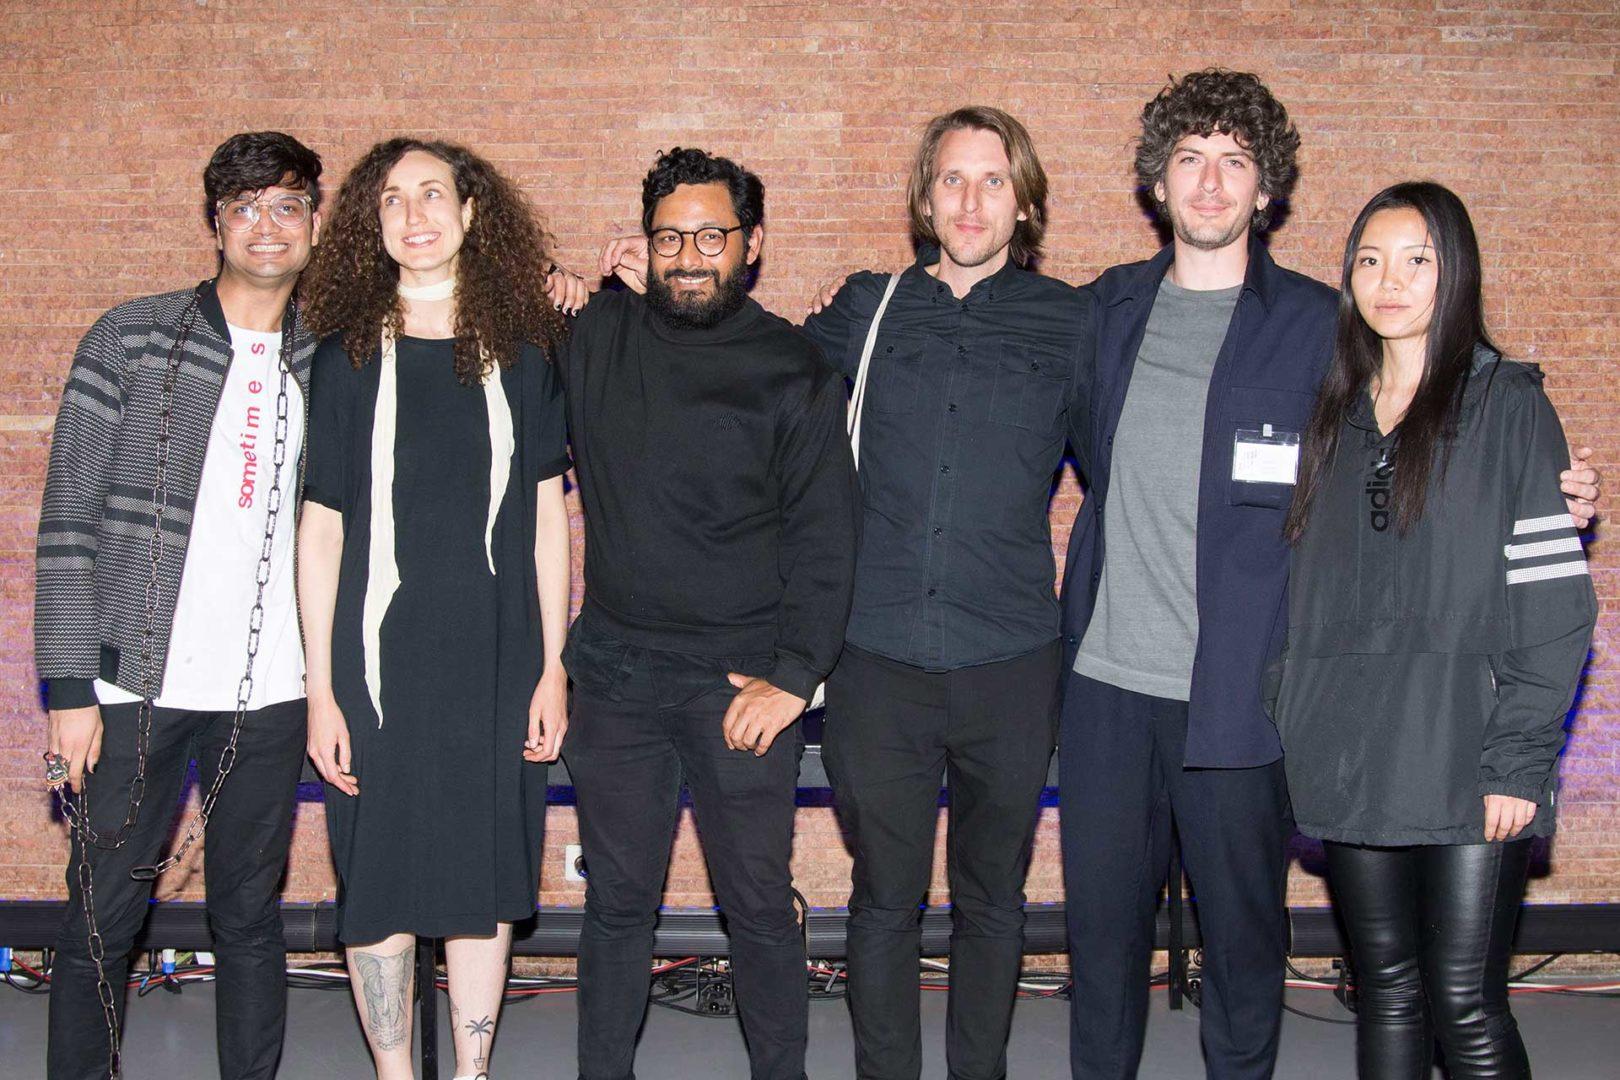 Abhijan Toto, Julia E Dyck, Omar A. Chowdhury, Jon Stam, Saverio Cantoni, and MIIIN